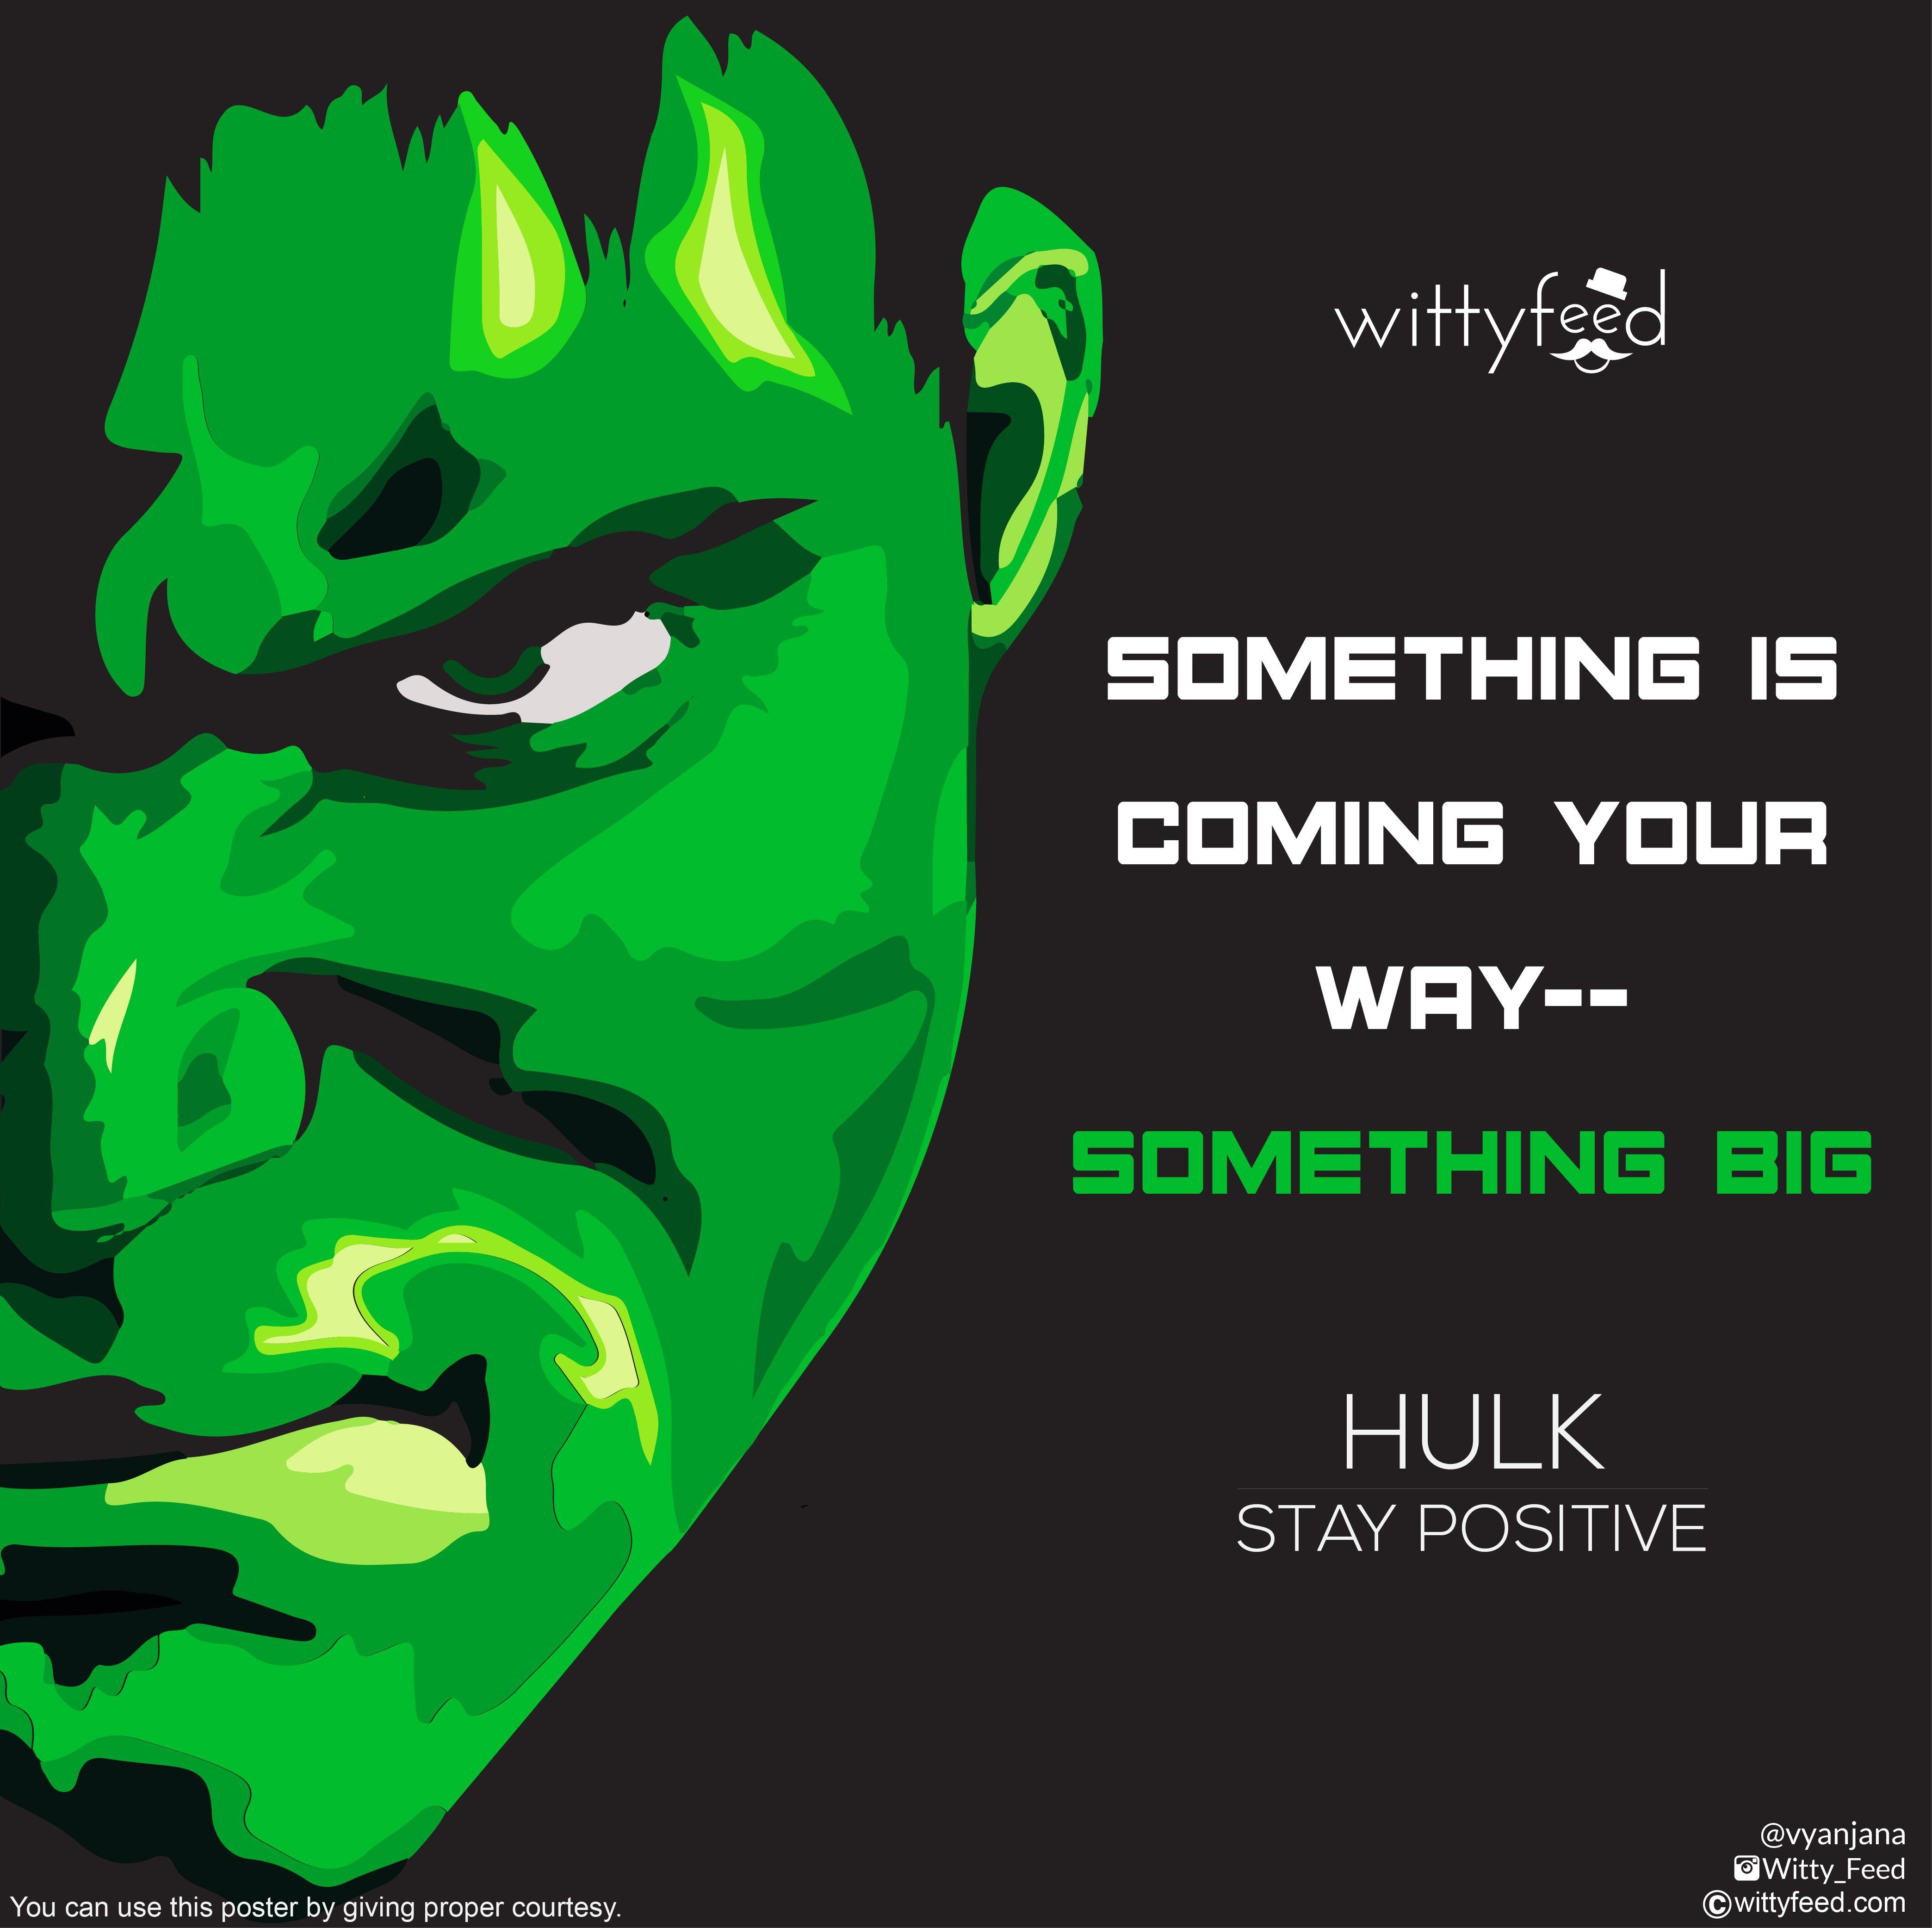 errrr grr arragarrarhhhhh Superhero quotes, Promote book